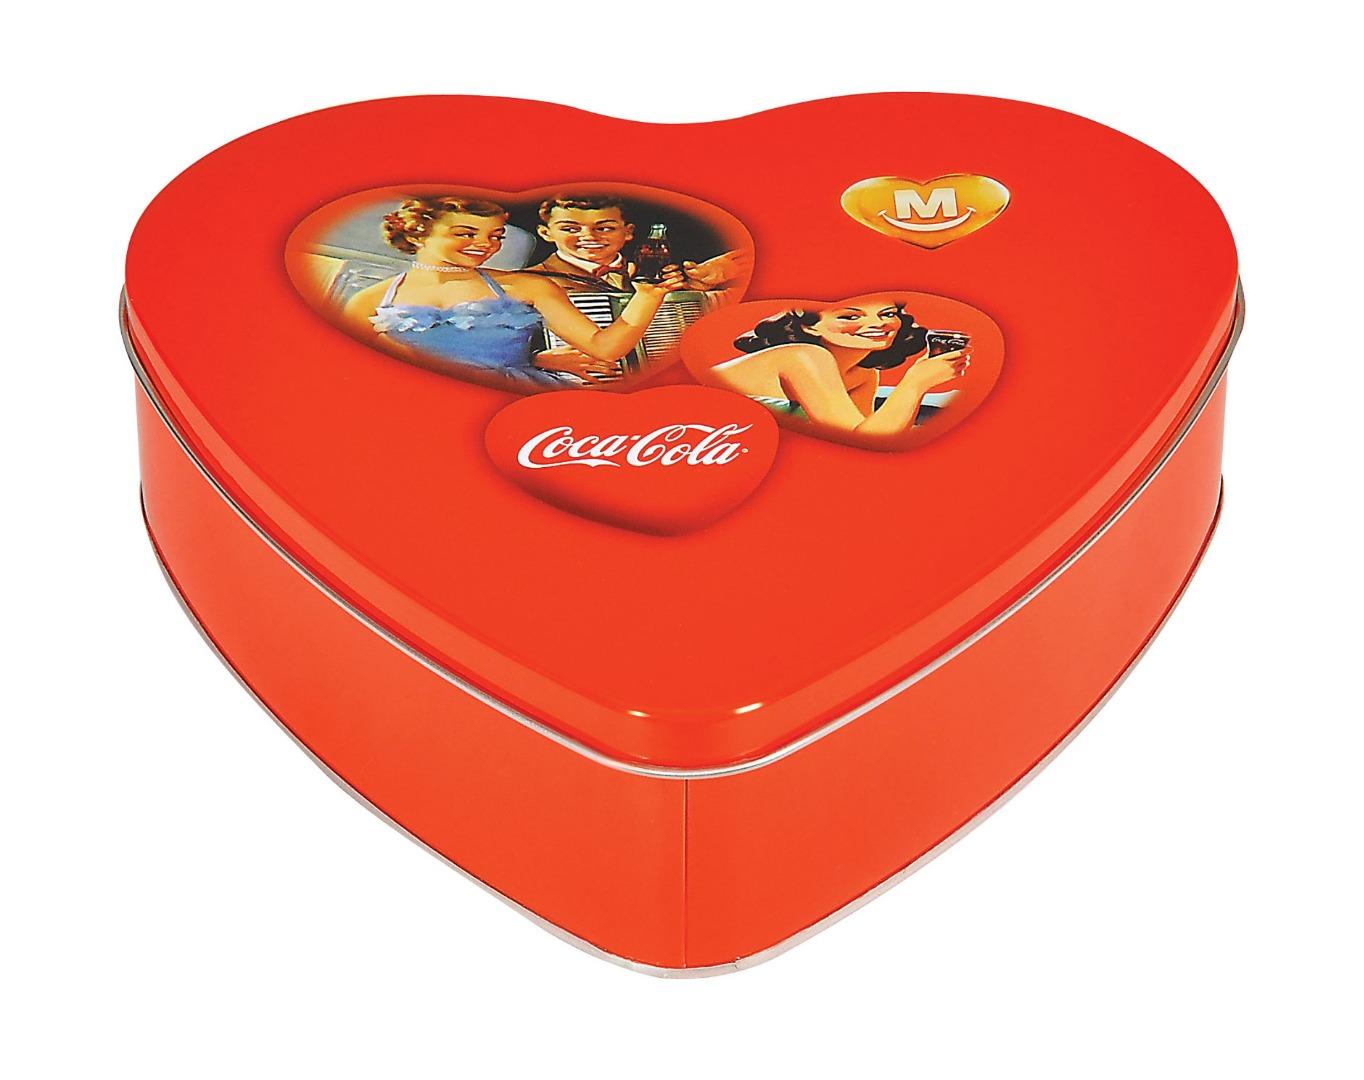 Coca Cola - 235x223x60 h. - Metal Box - Heart - Promotion